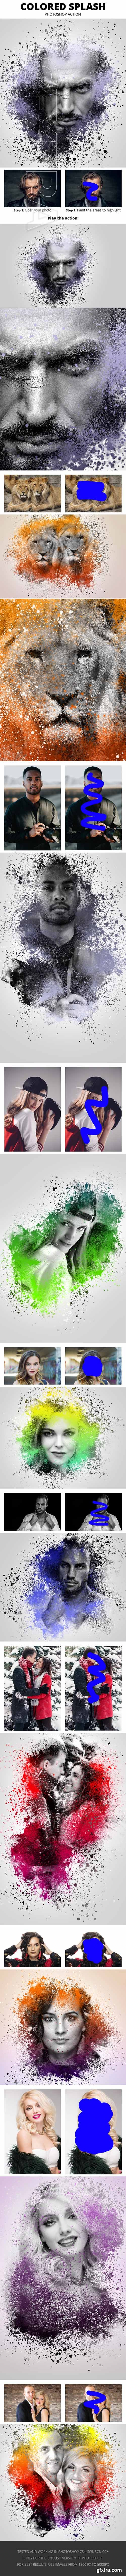 GraphicRiver - Colored Splash Photoshop Action 22794175